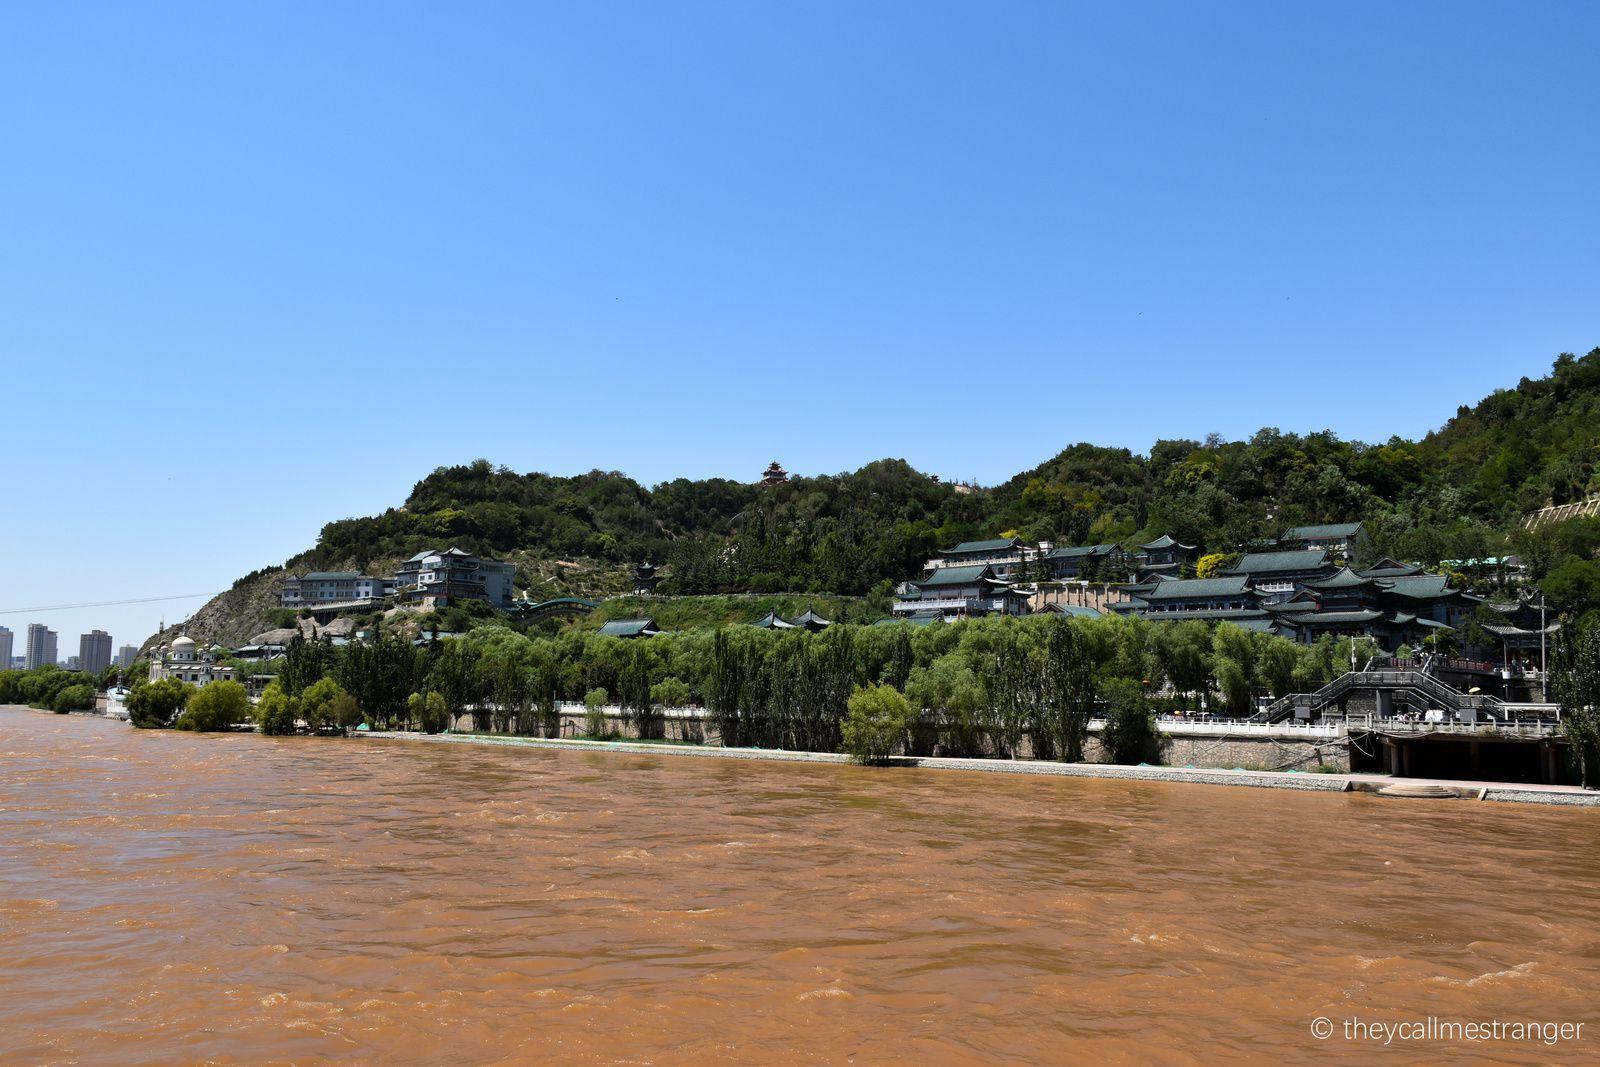 Lanzhou 兰州, capitale du Gansu